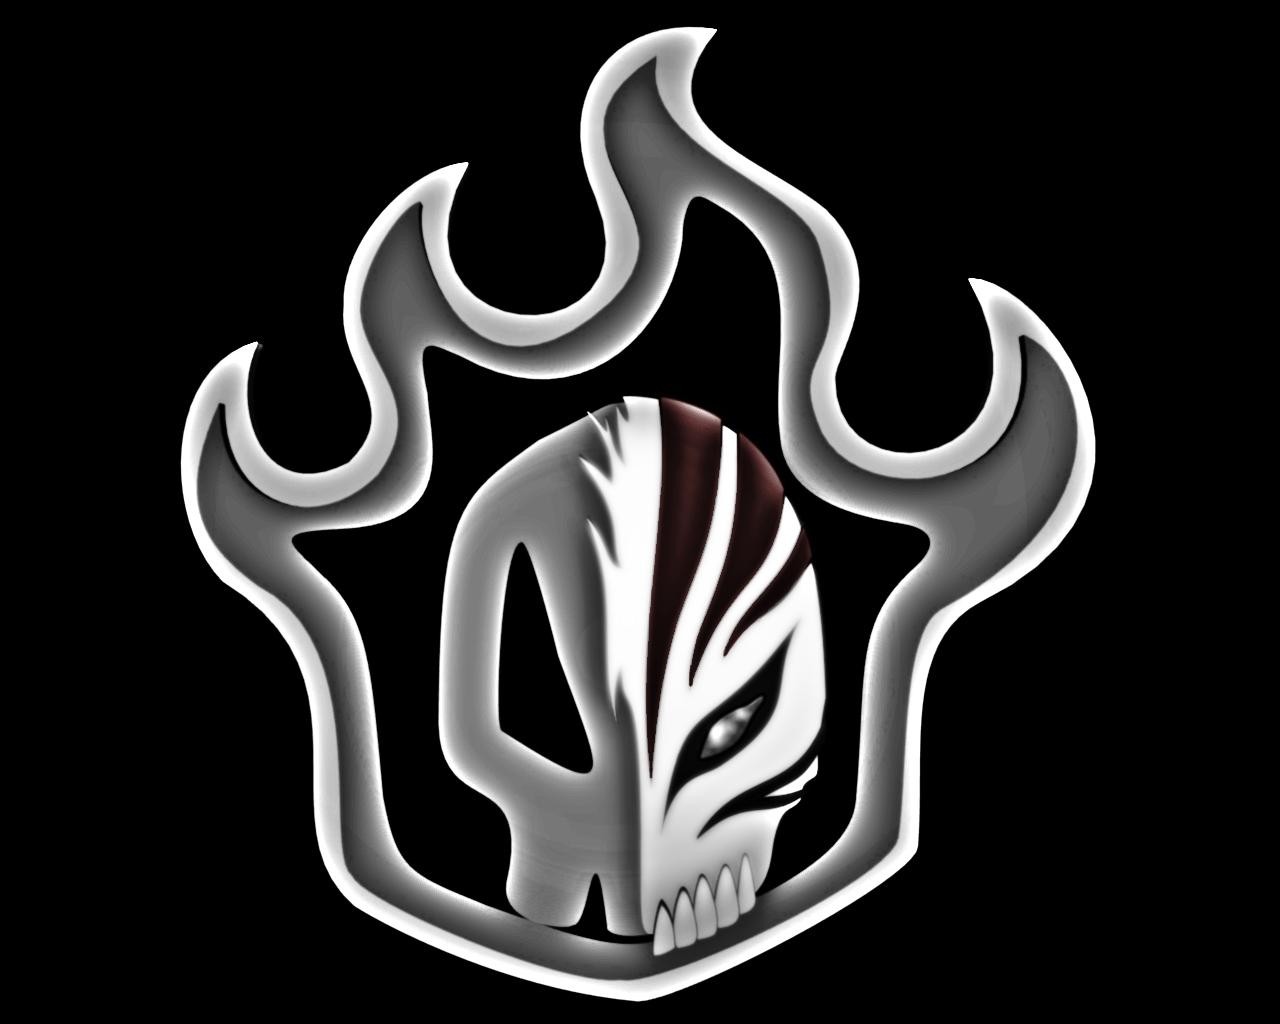 Bleach Flaming Skull Logo by Davewoods